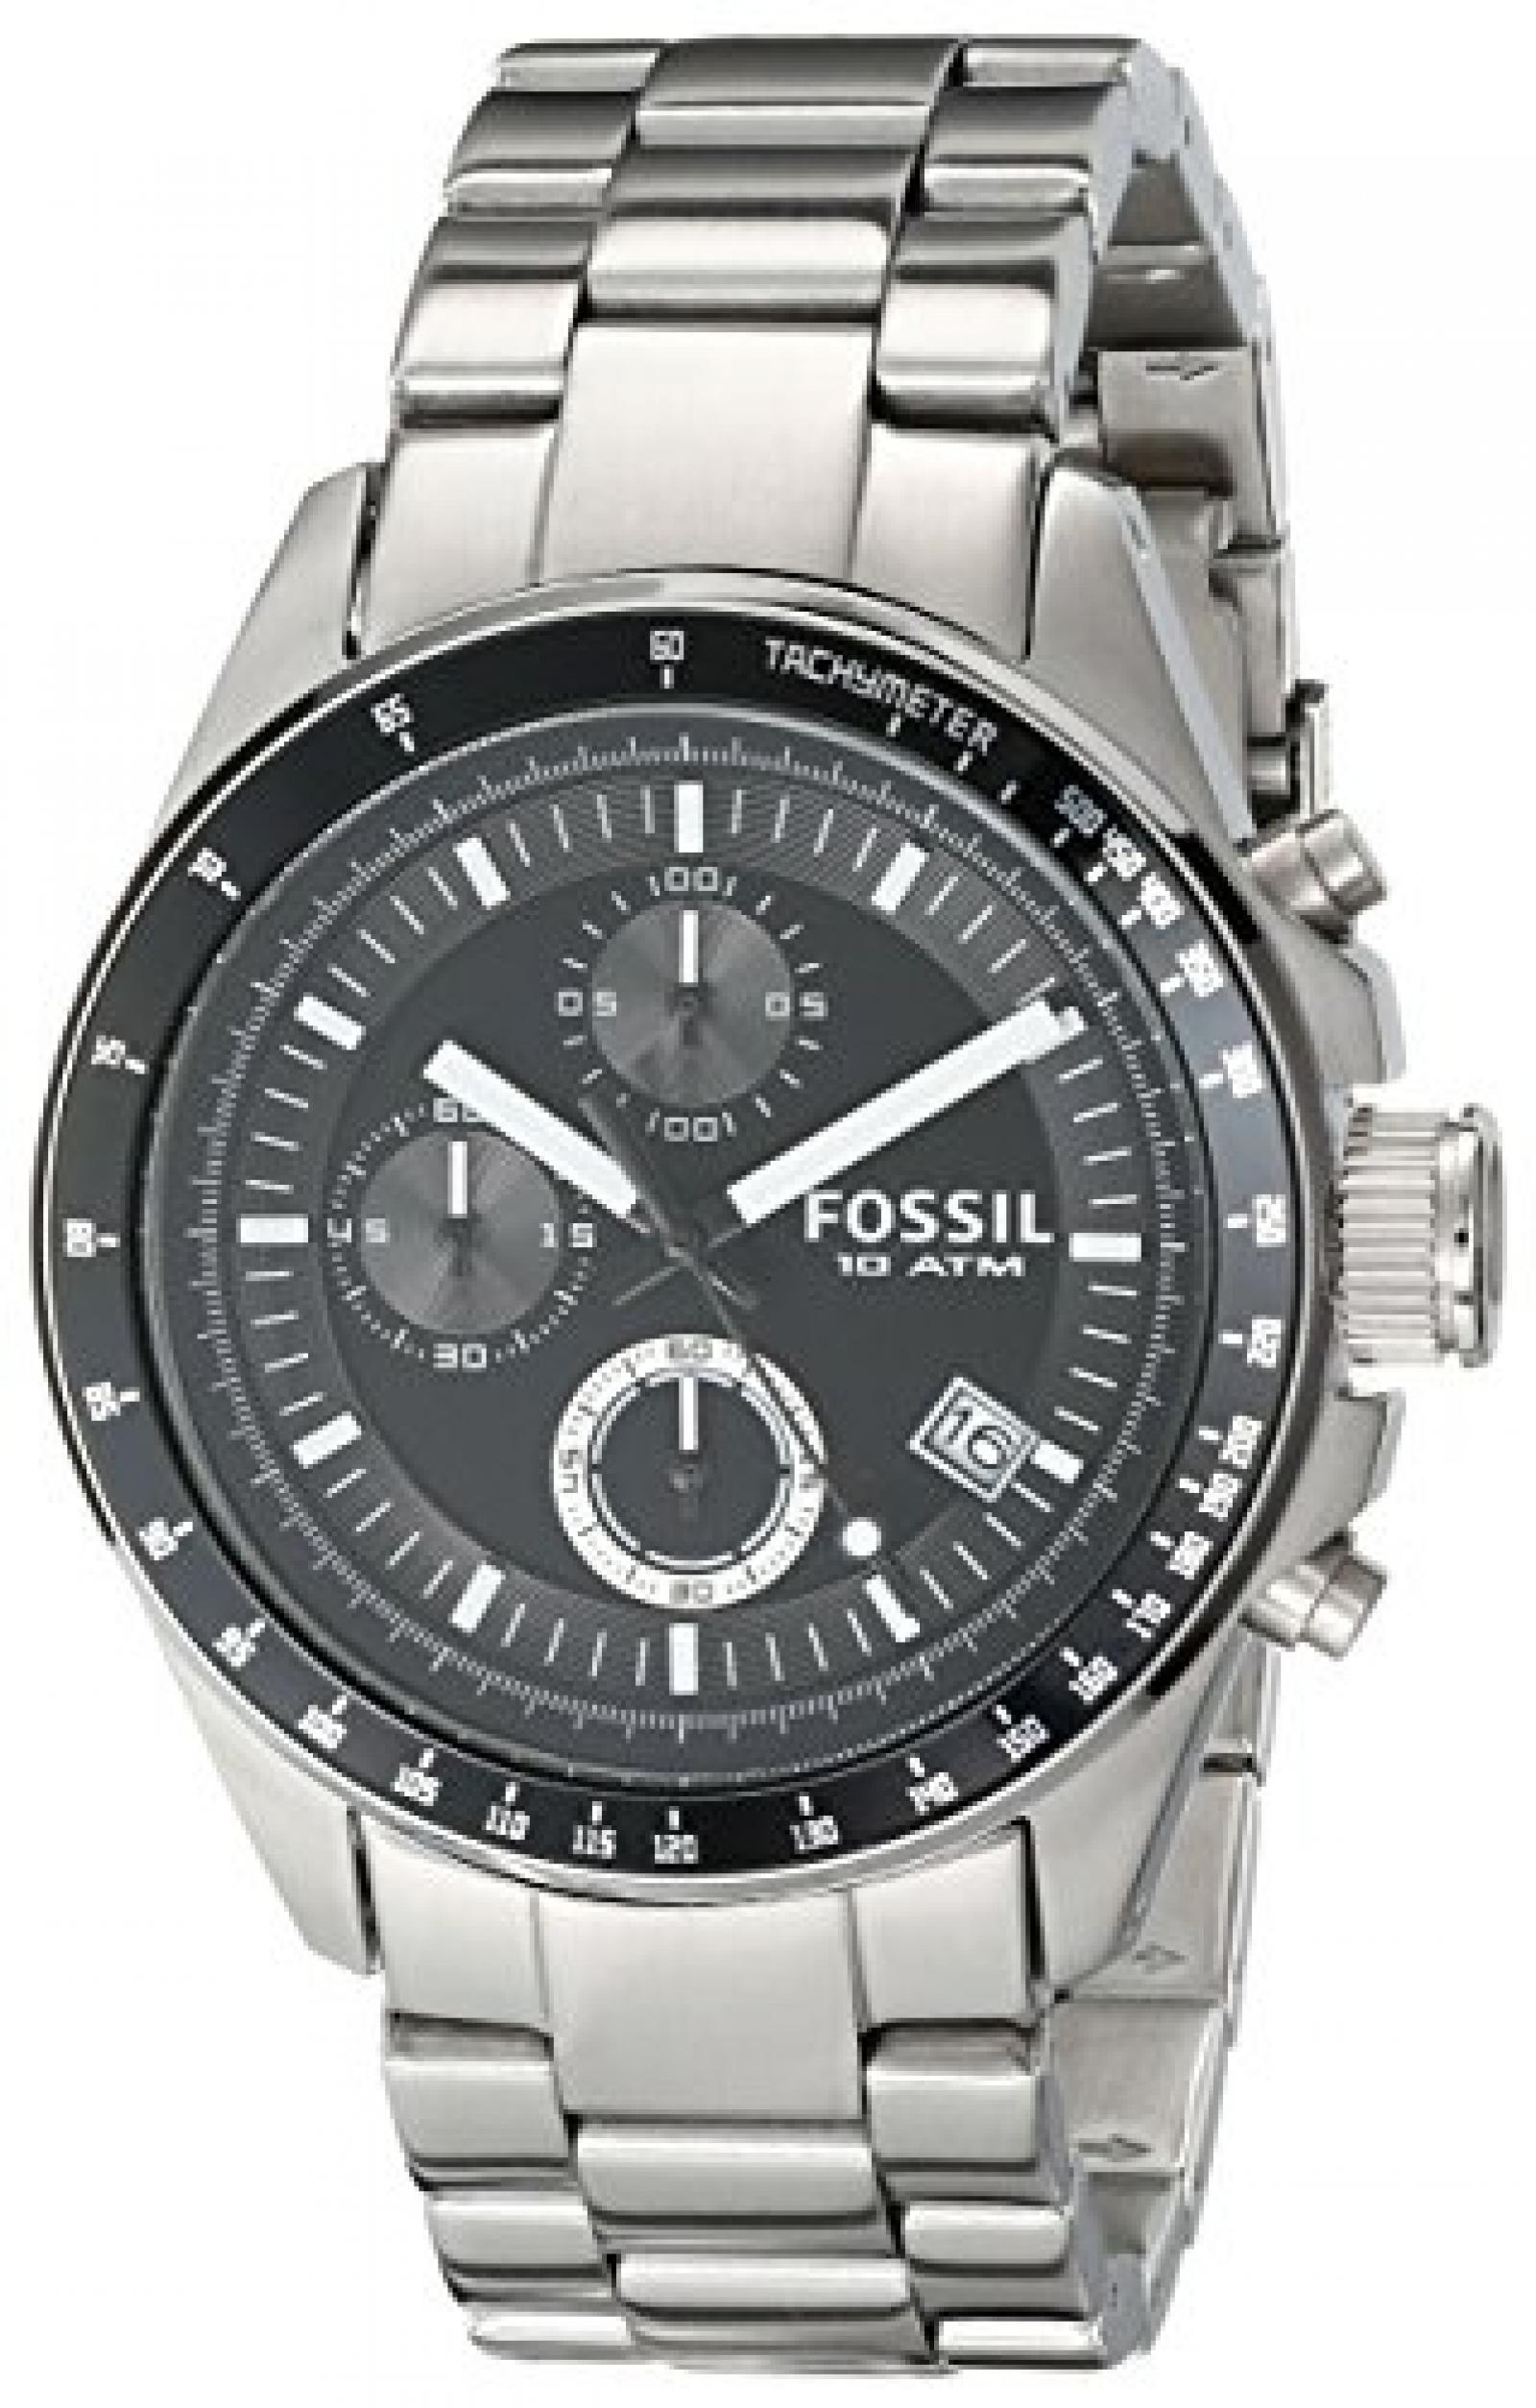 Fossil Herren-Armbanduhr Chronograph Edelstahl silber Sport Gents CH2600